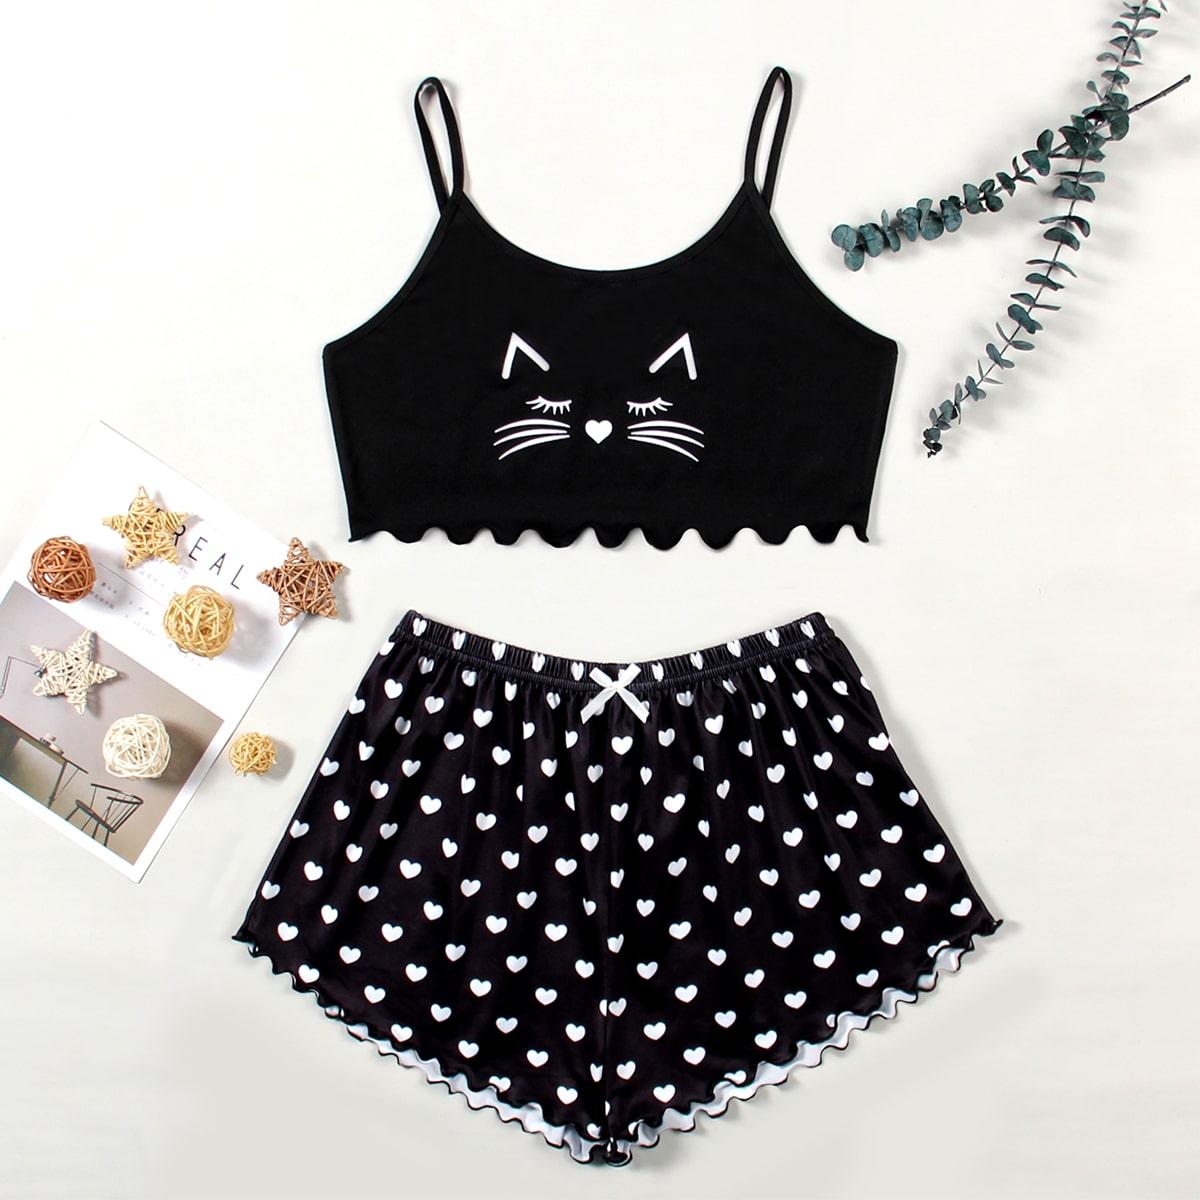 SHEIN / Cartoon And Heart Print Lettuce Trim Cami Pajama Set